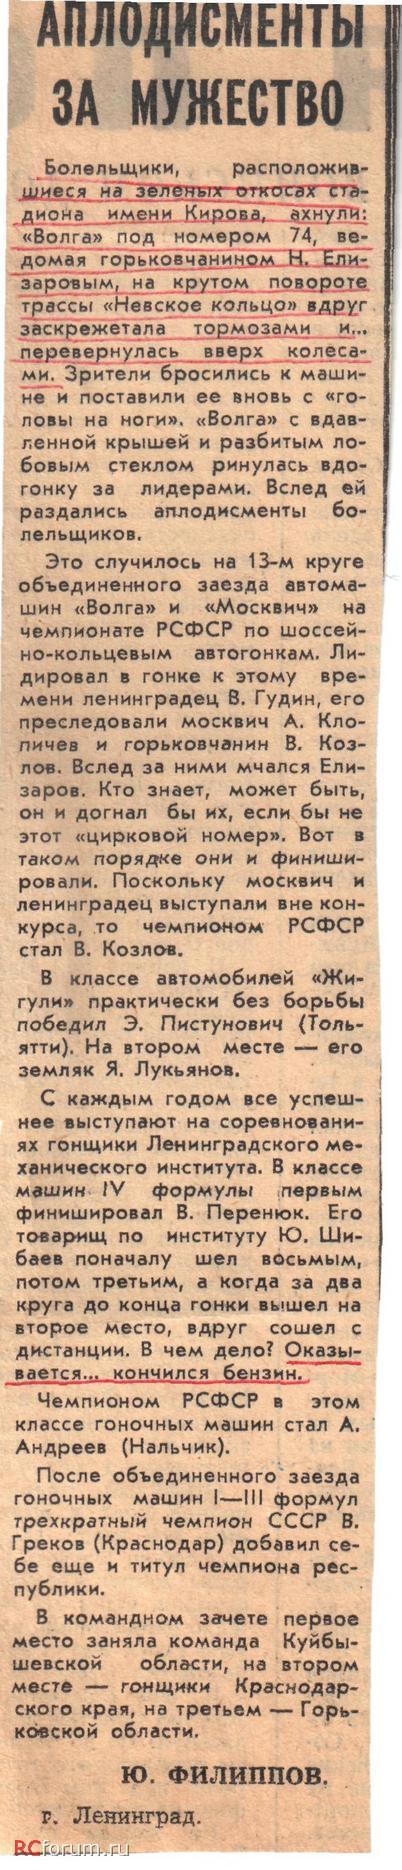 http://se.uploads.ru/t/NPjMz.jpg